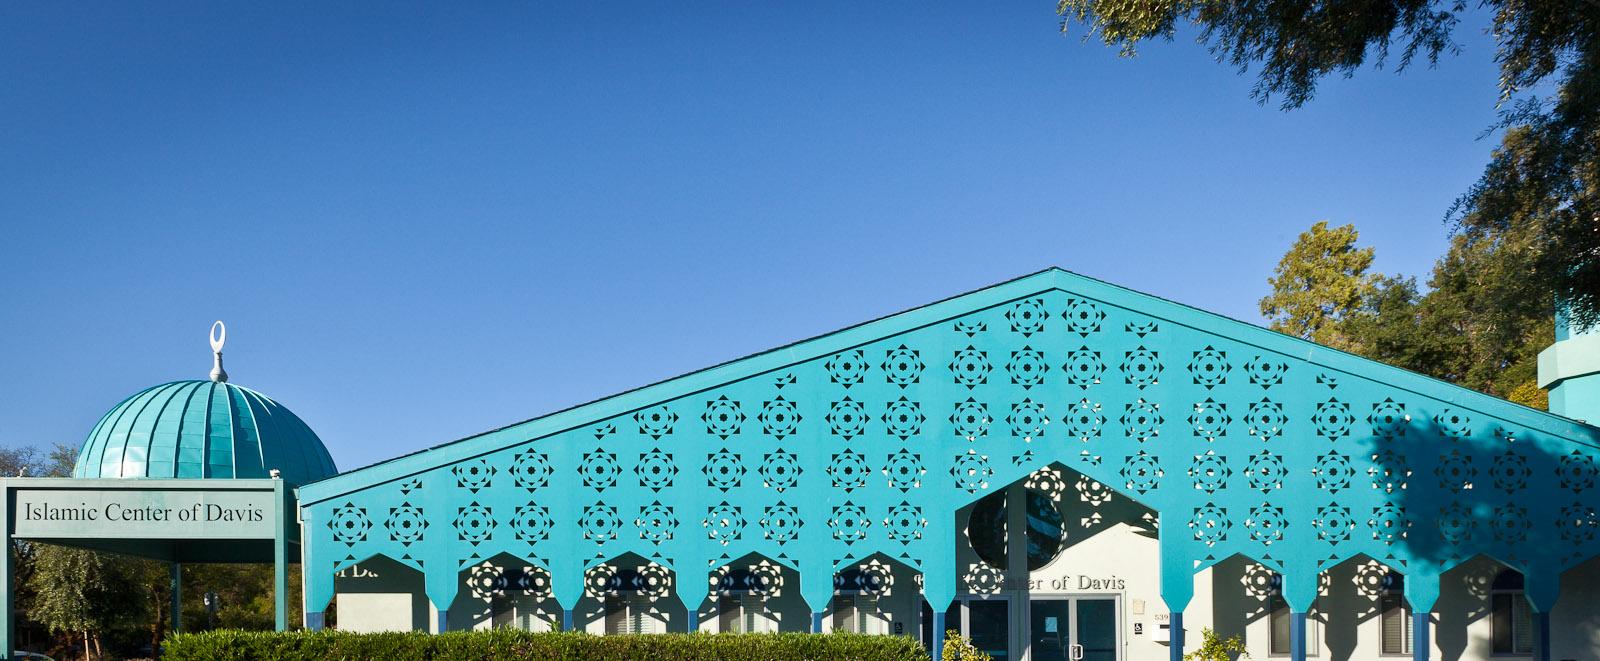 This is the Islamic Center of Davis designed by architect Maria Ogrydziak. Photo by Jay Graham